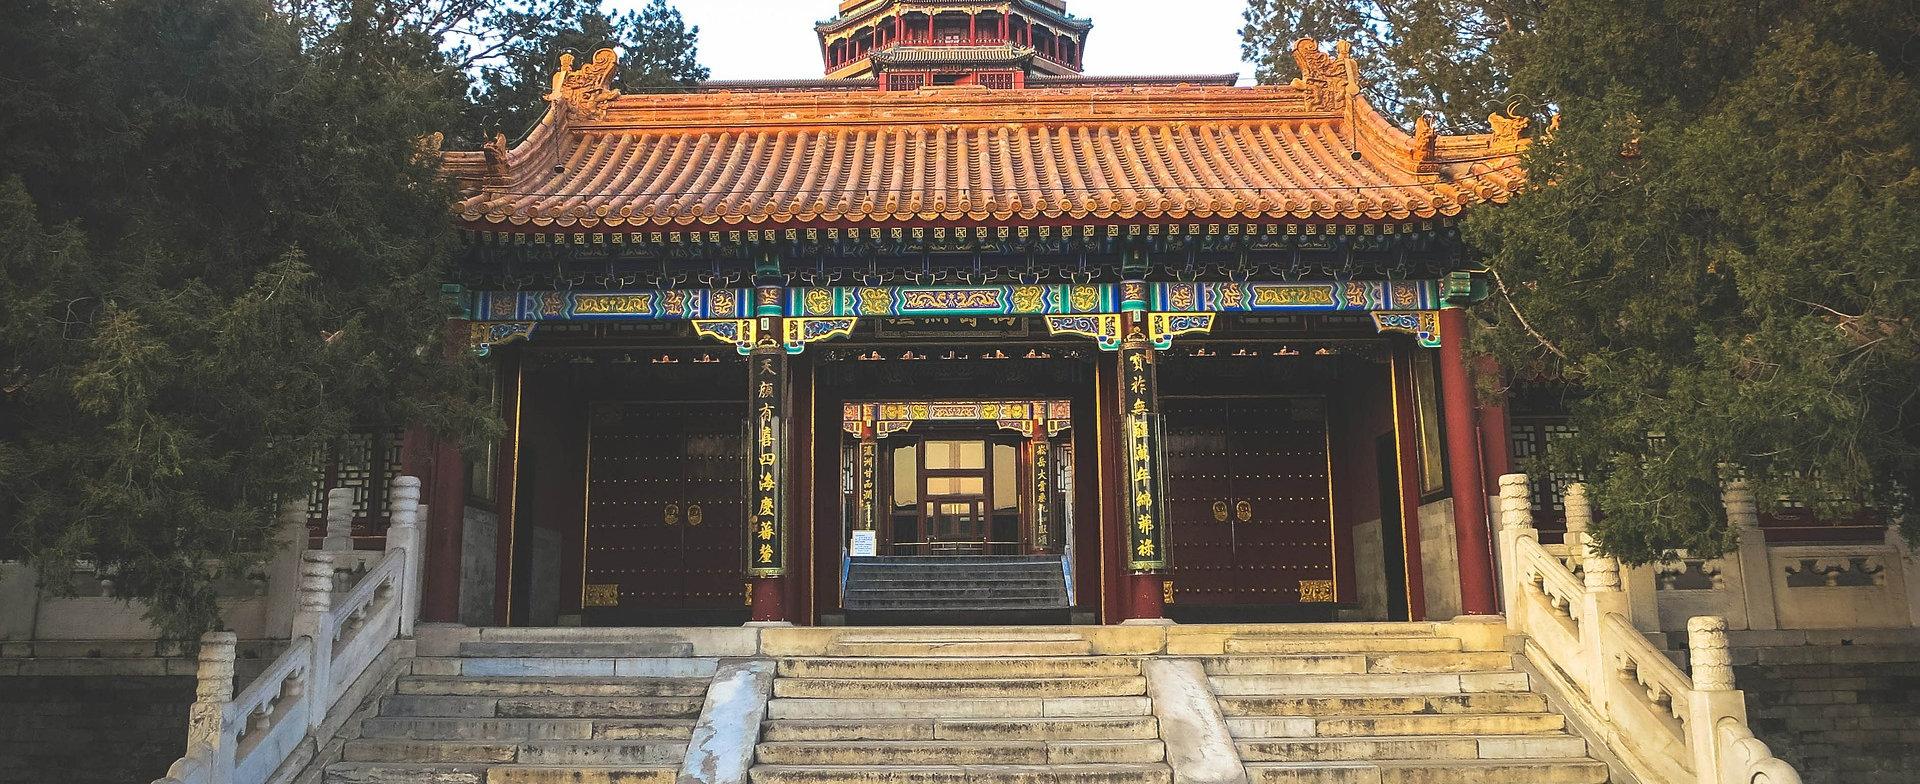 temple-594588_1920.jpg